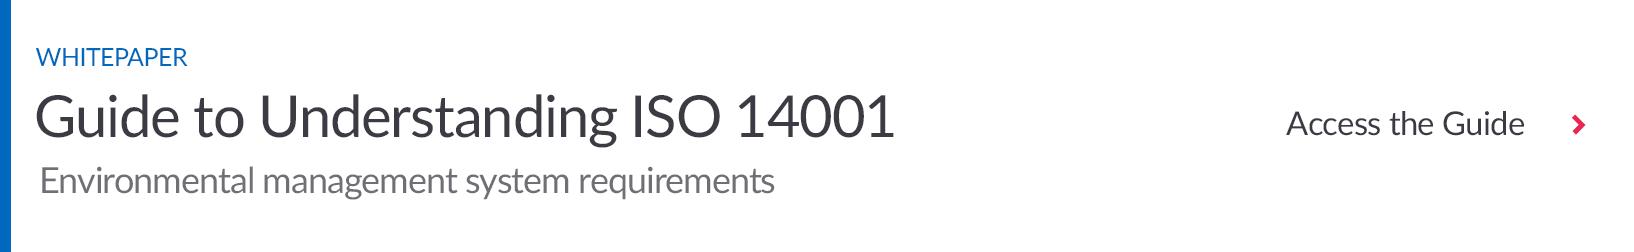 Download Guide to Understanding ISO 14001